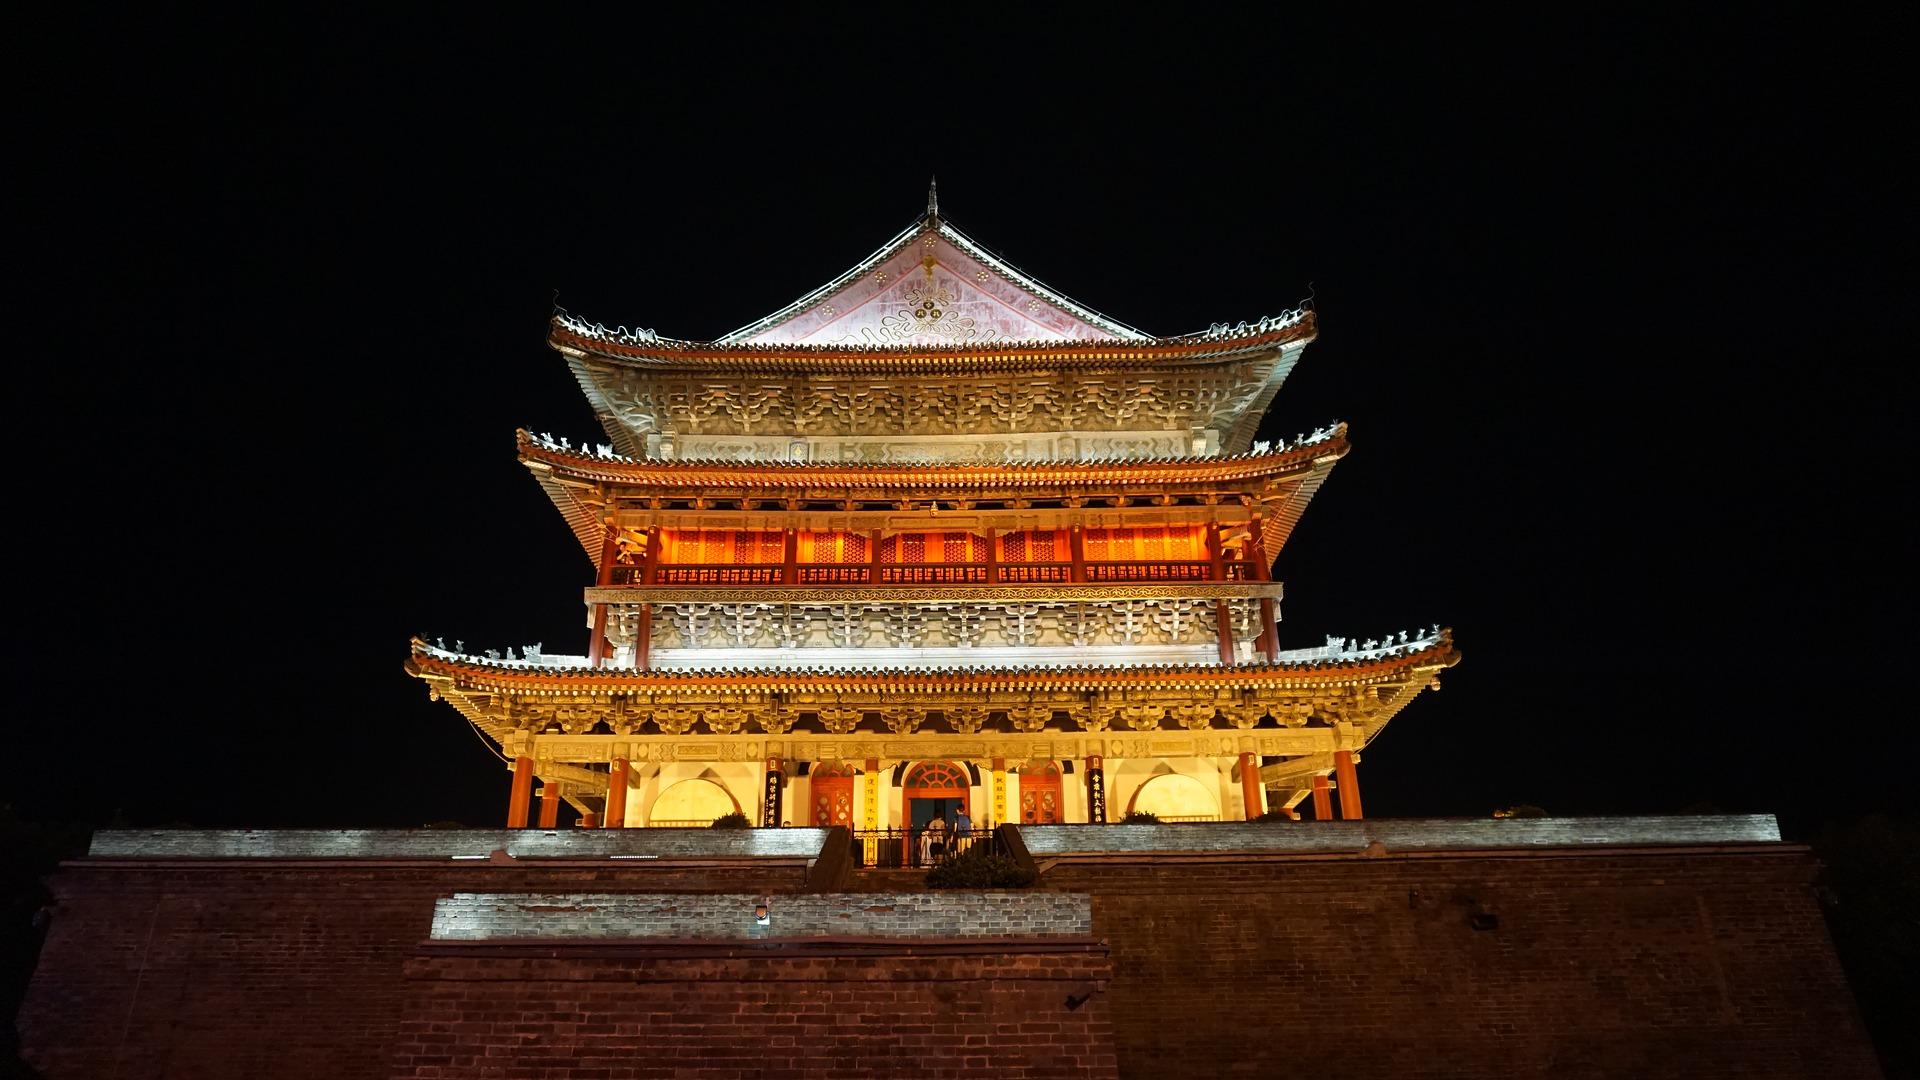 Xian Architecture - China